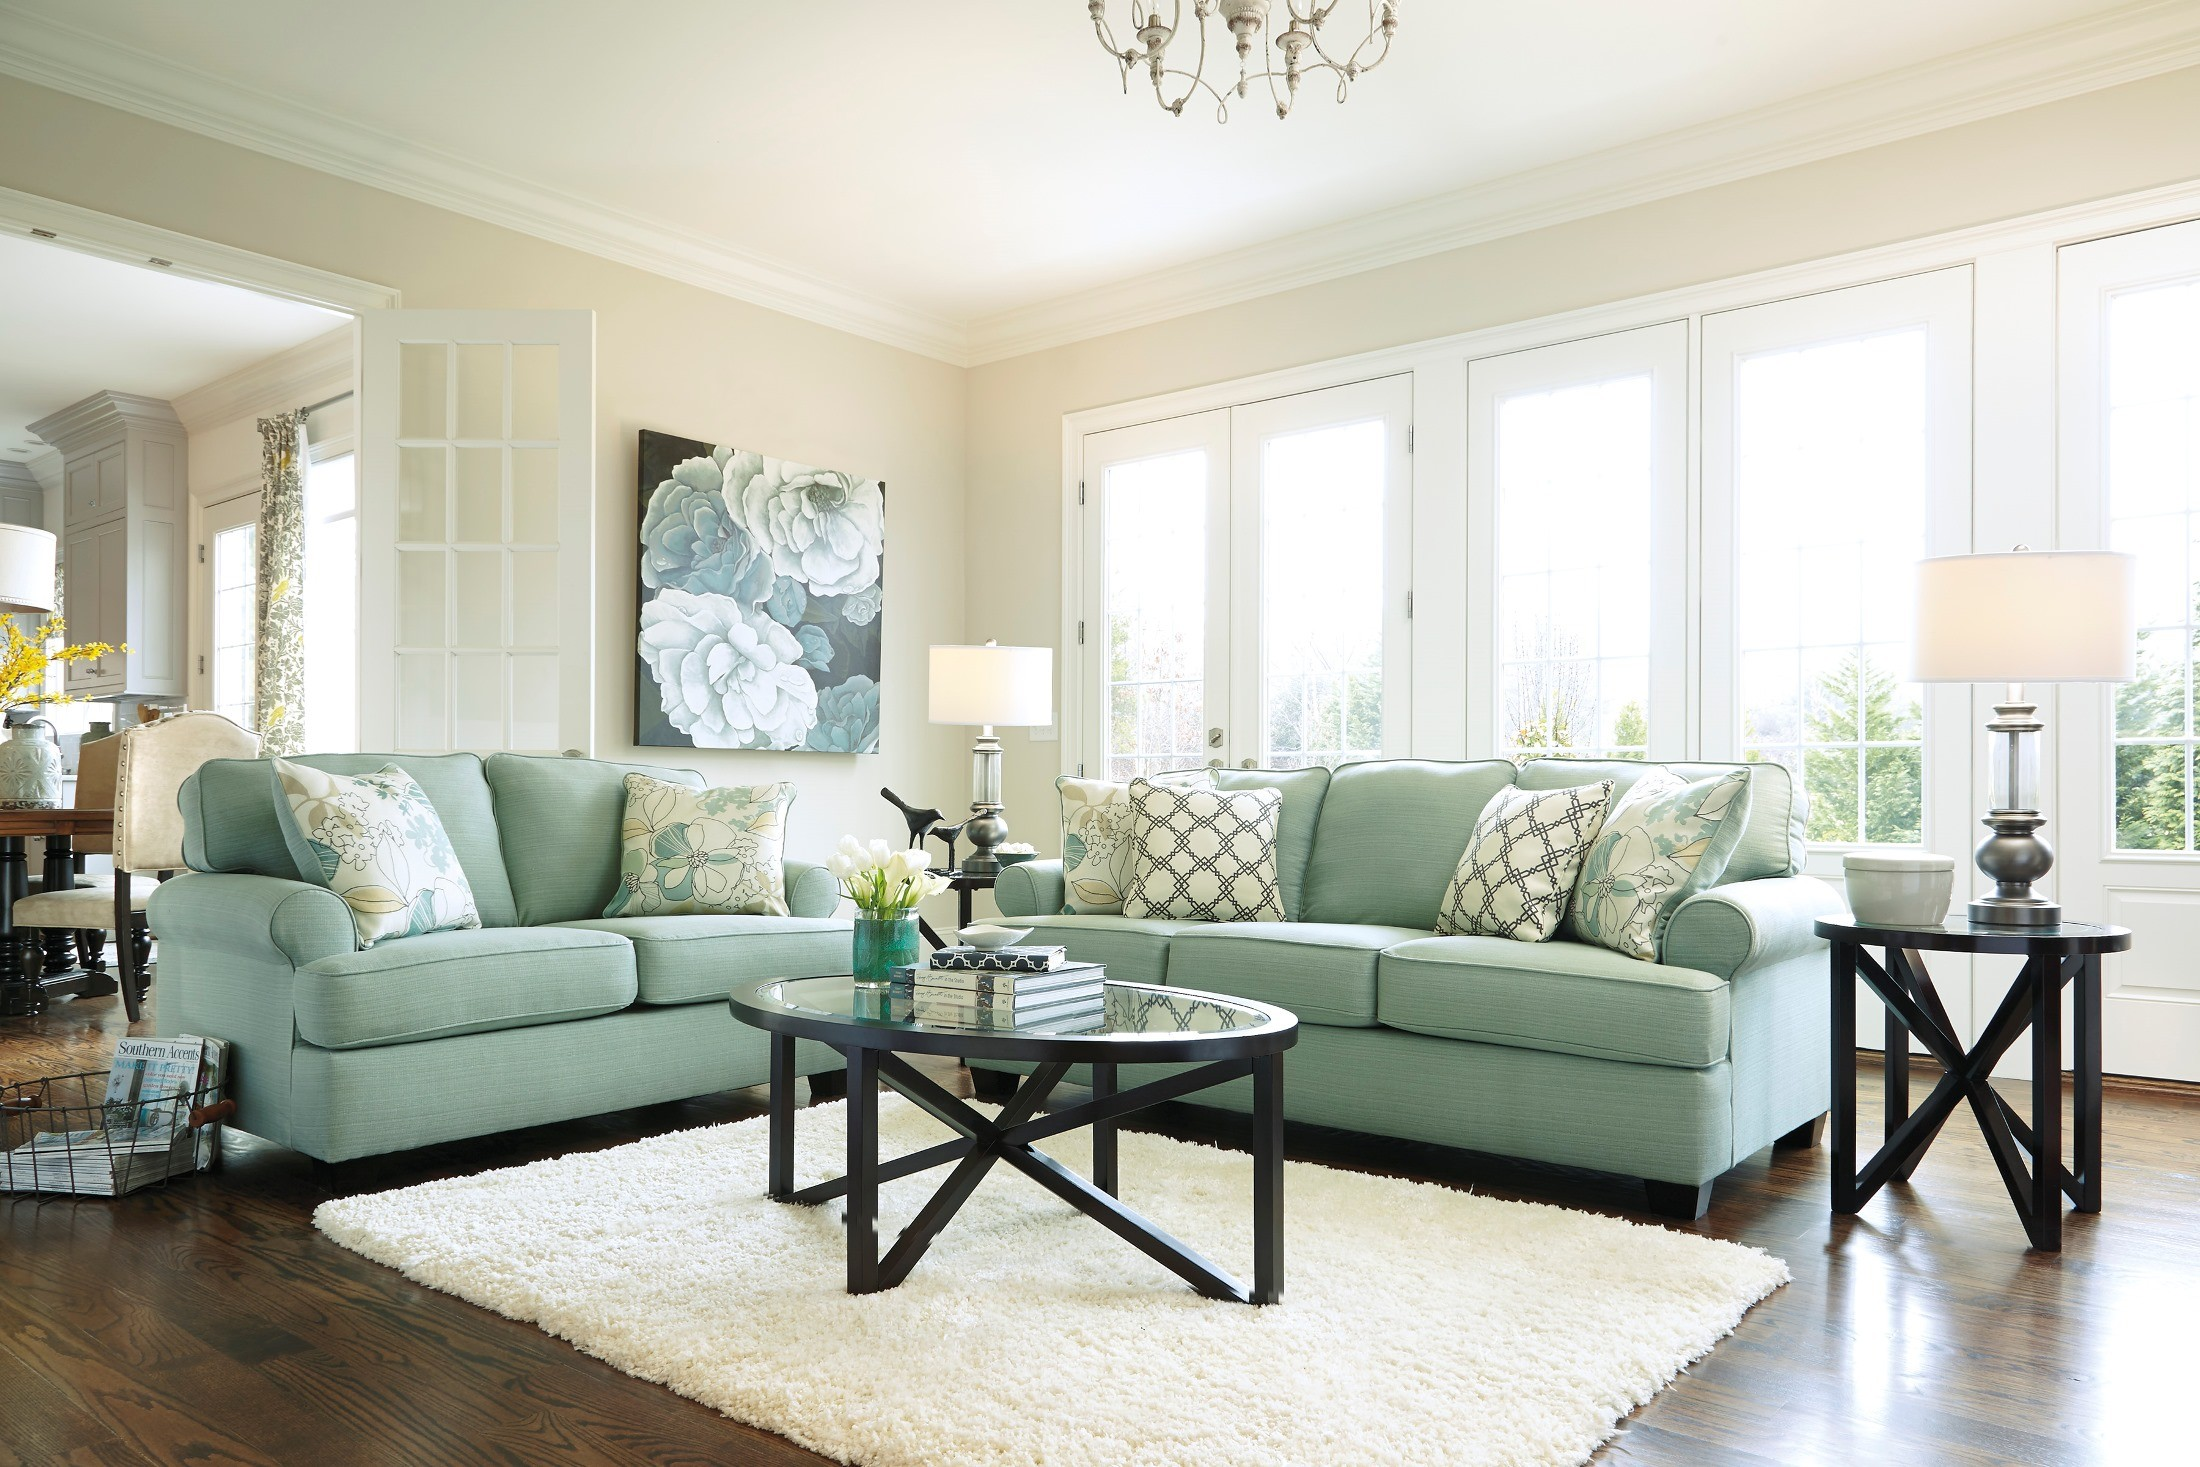 Kylee Lagoon Living Room Set Daystar Living Room Set From Ashley 28200 38 35 Coleman Furniture